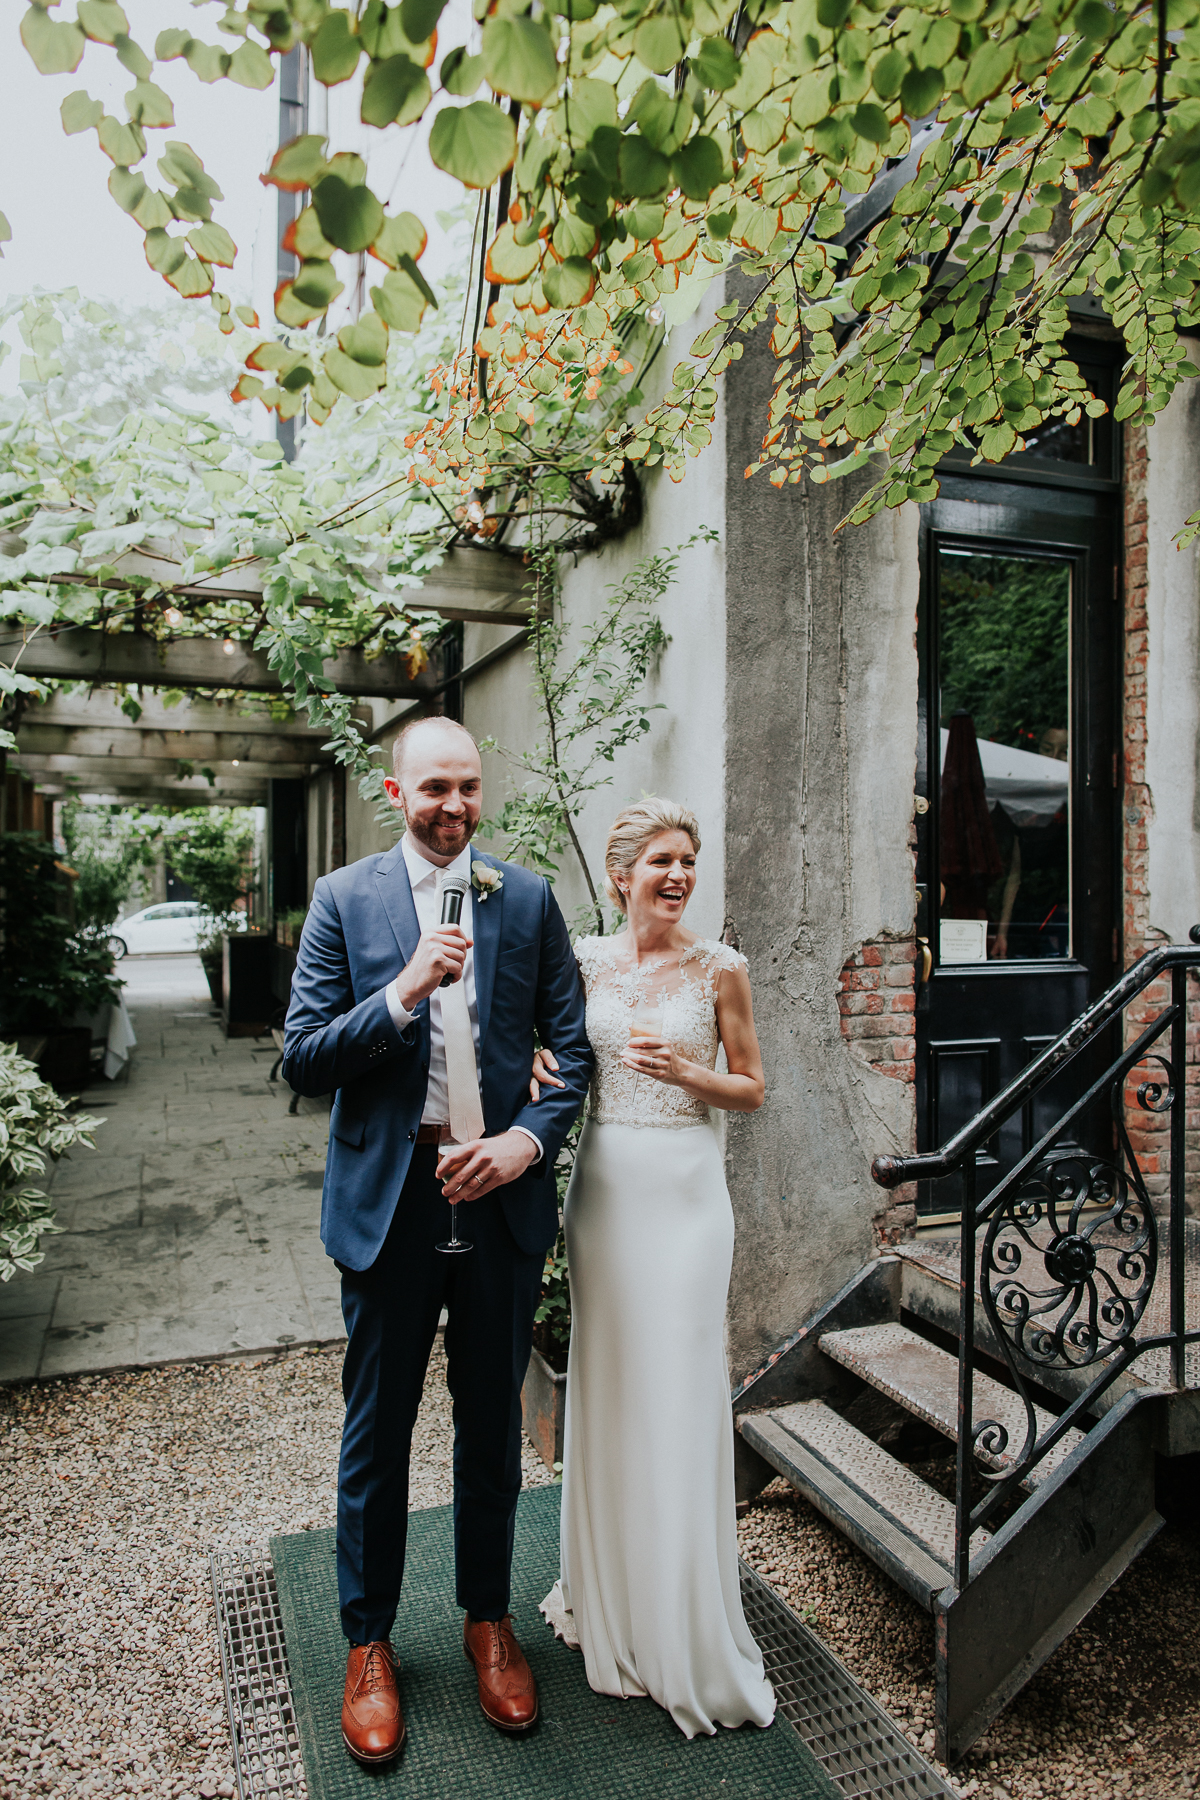 Frankies-457-Spuntino-Intimate-Brooklyn-Restaurant-Wedding-Photographer-66.jpg